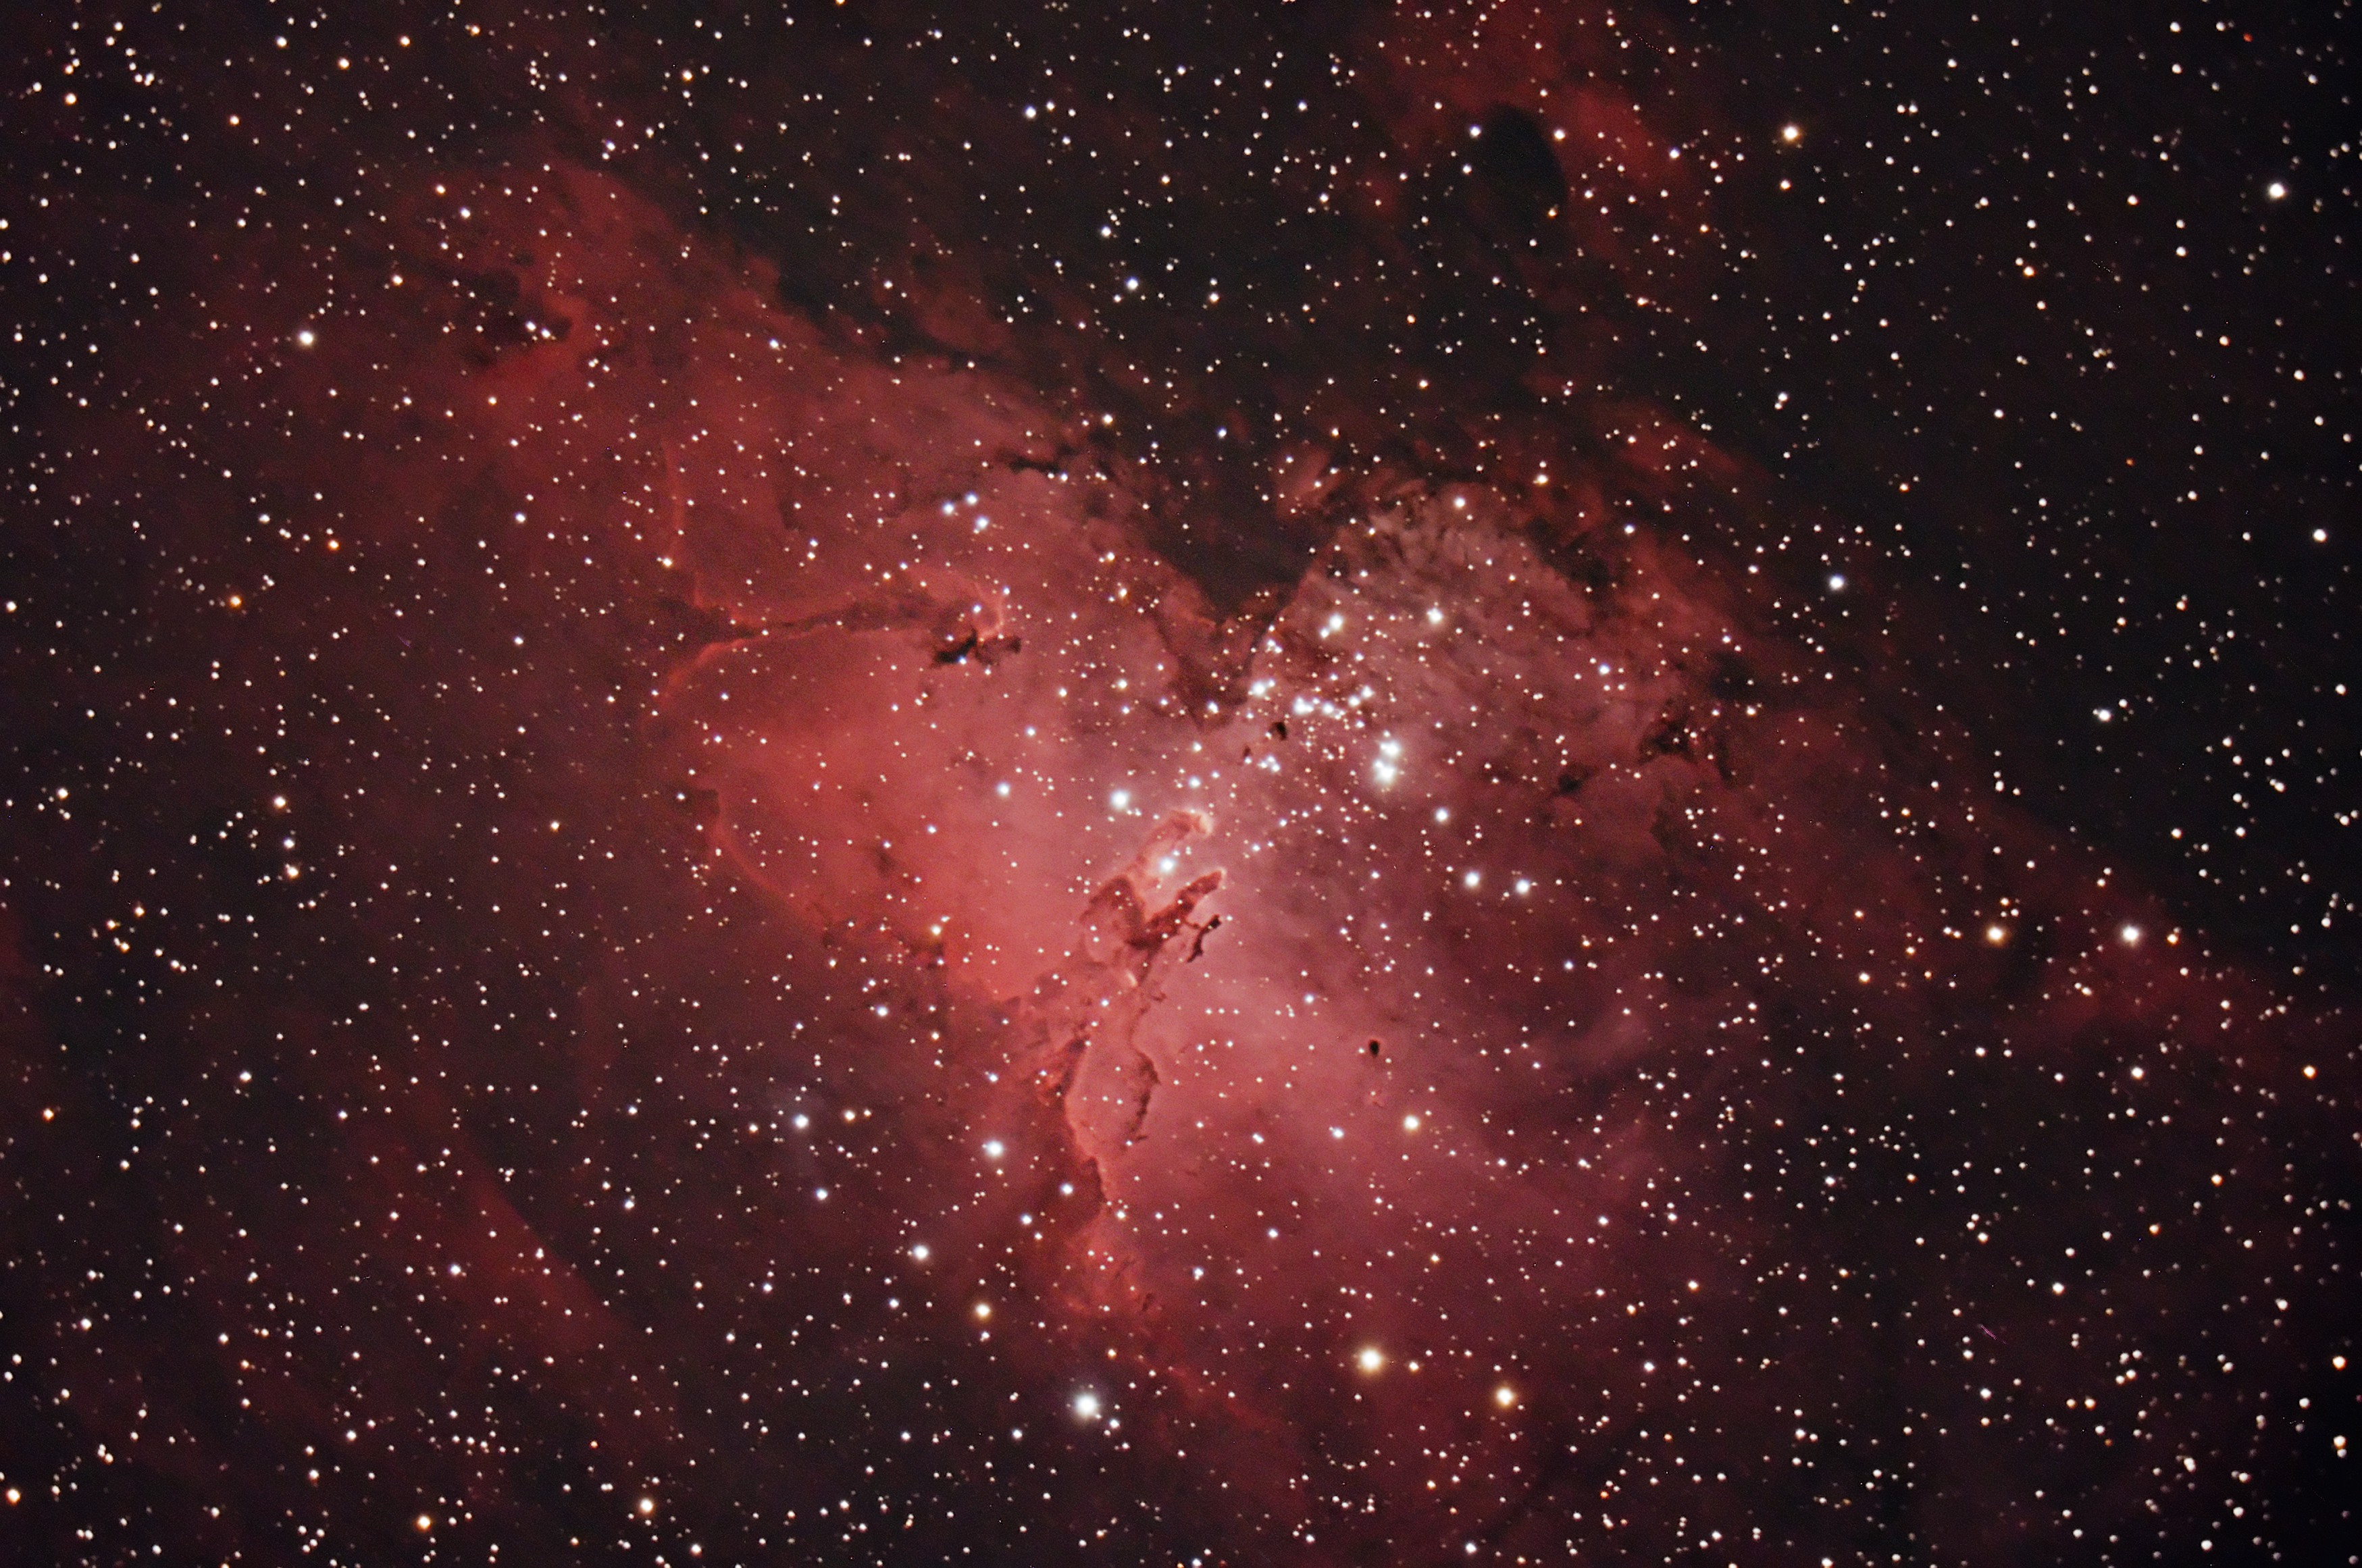 M16 The Eagle Nebula, August 2010.